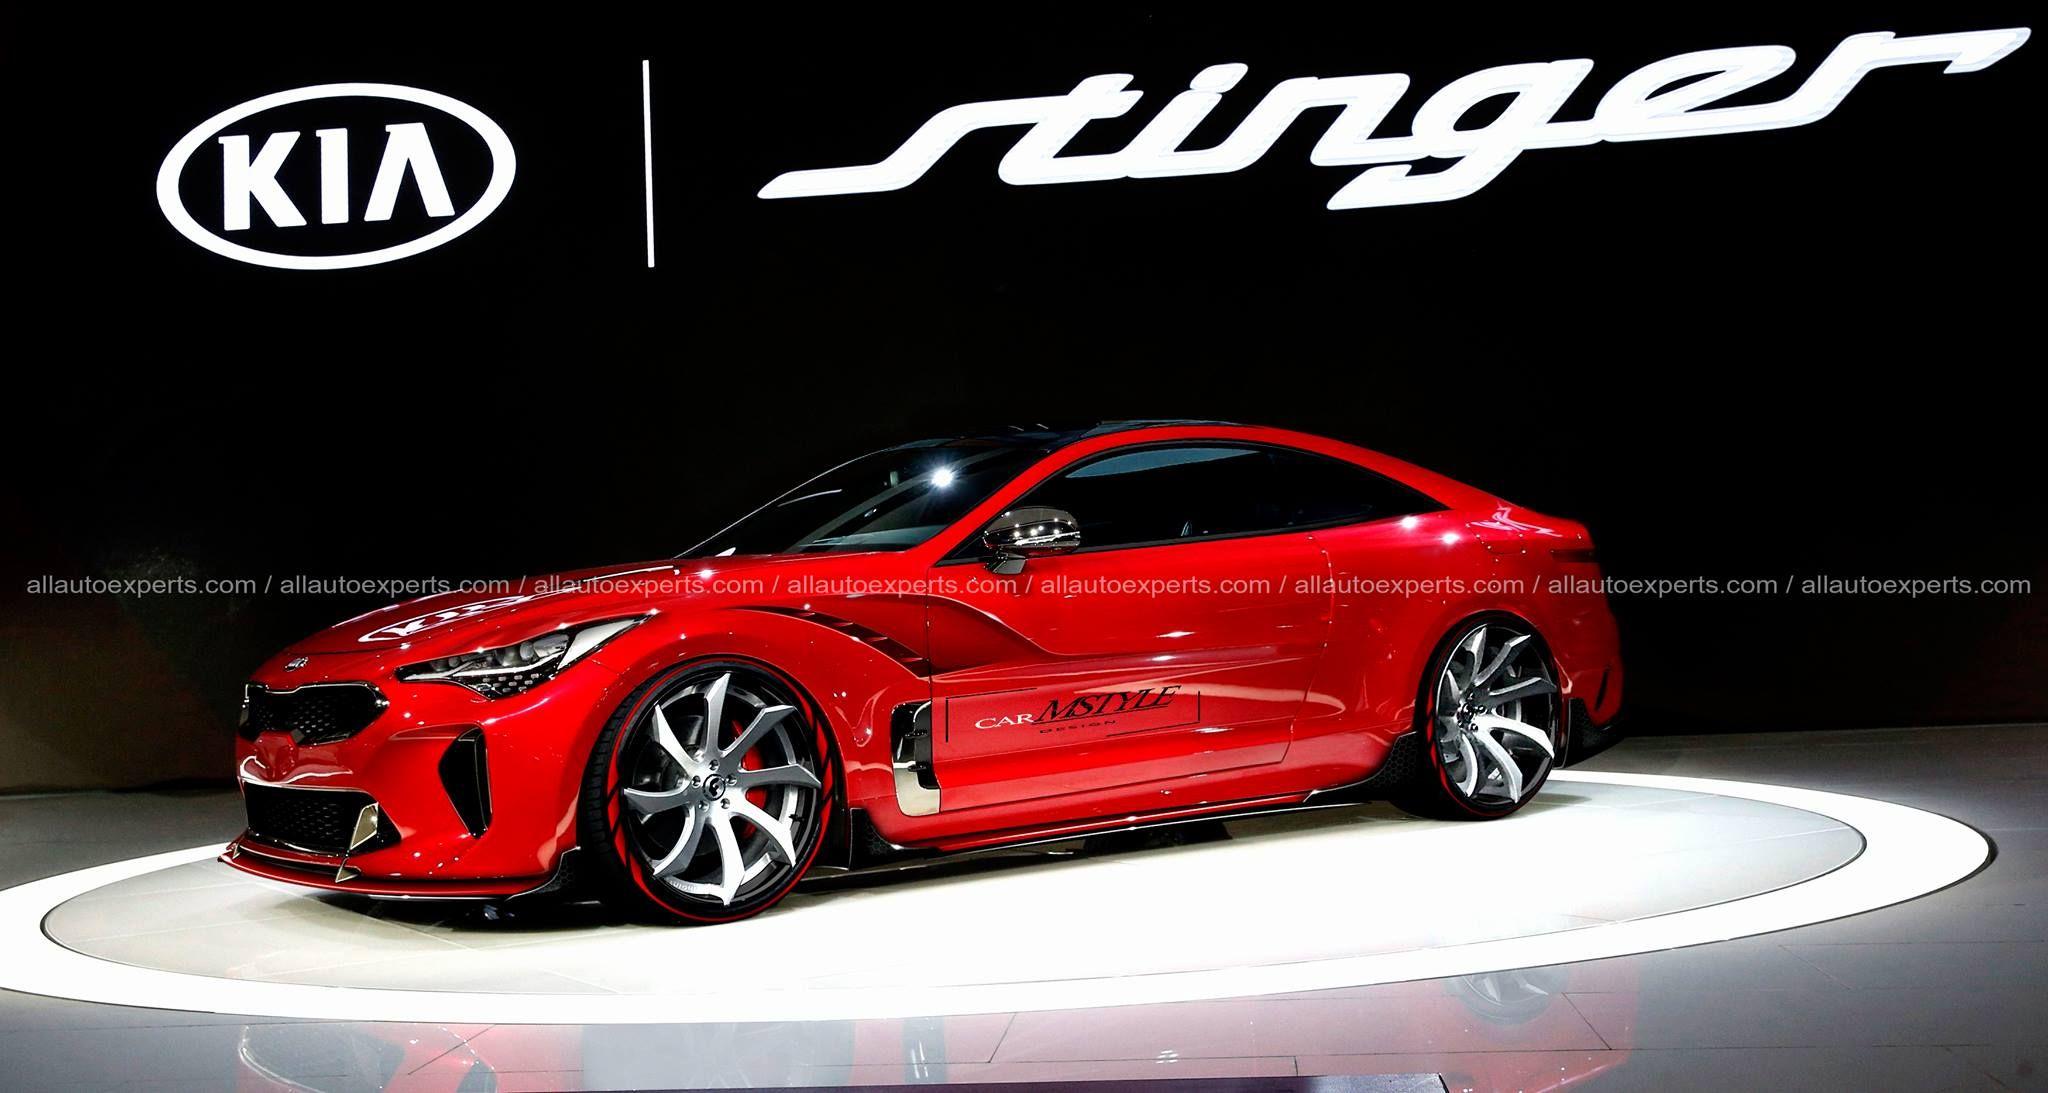 Kia Stinger Gt Coupe All Wheel Drive And Turbo Aspirated Engine Preview The Koreans Didn T Abandon Their Promises Made Some Time A Kia Stinger Kia Kia 2017